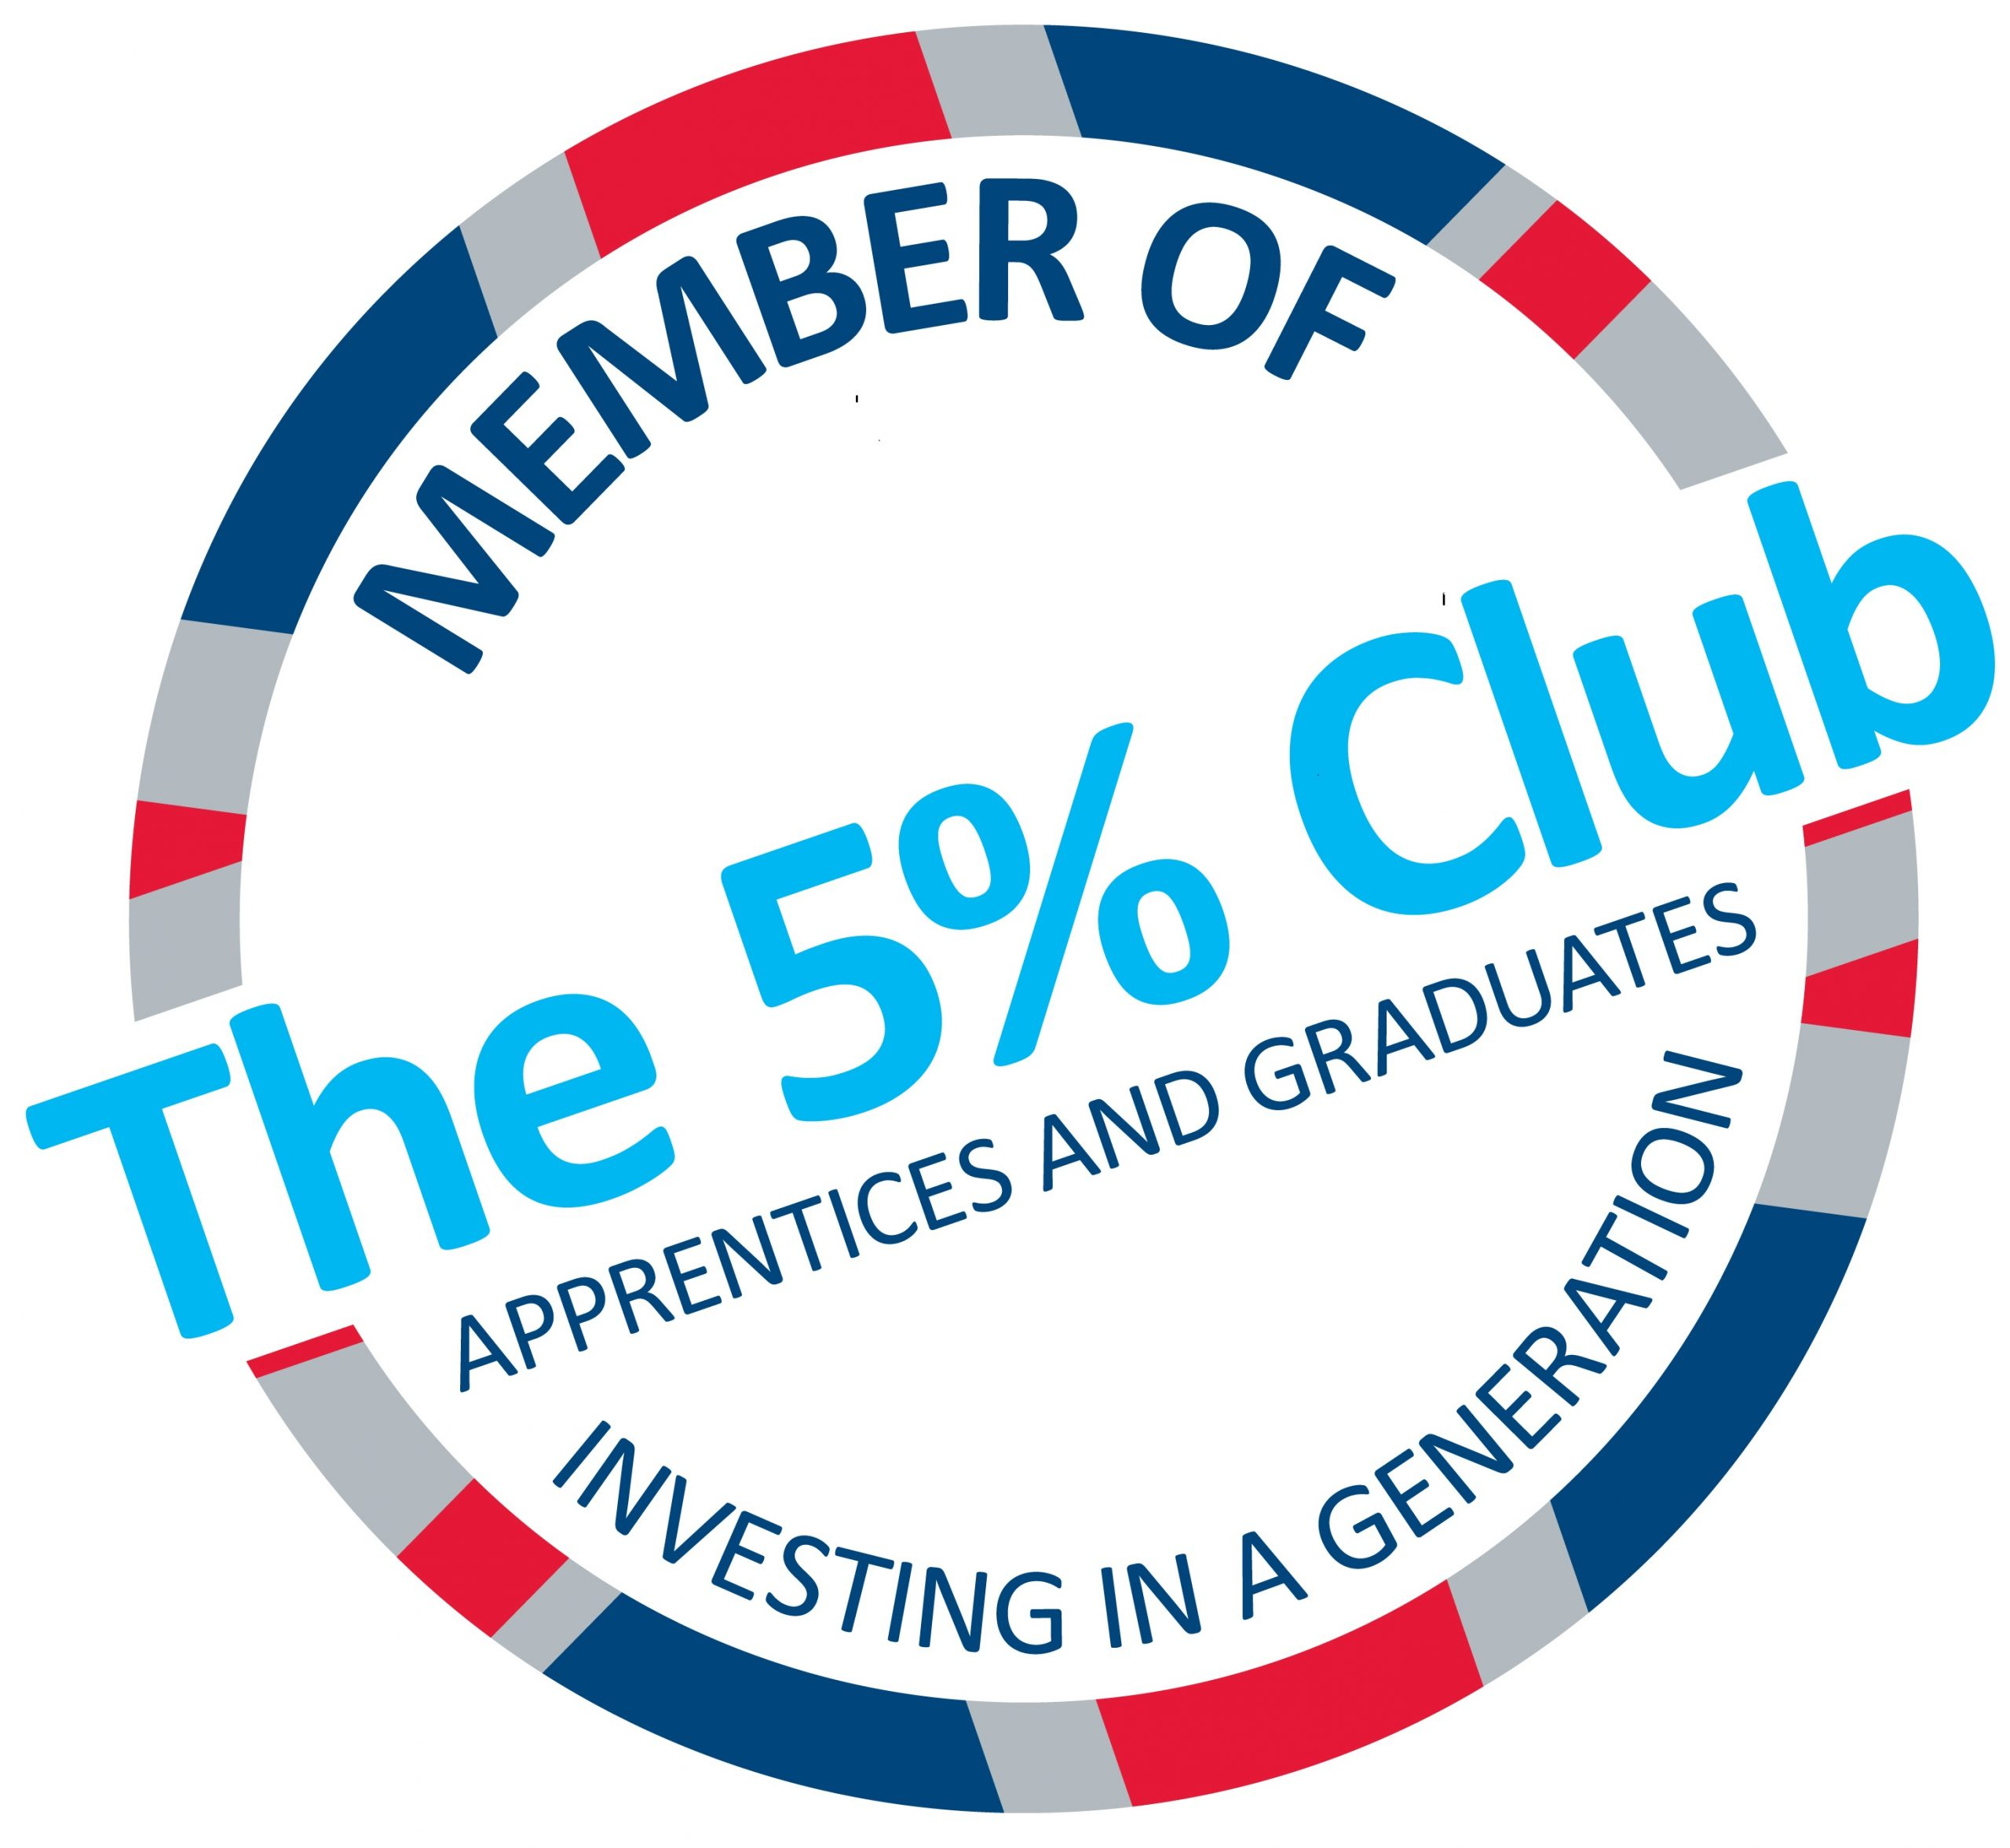 The 5% Club